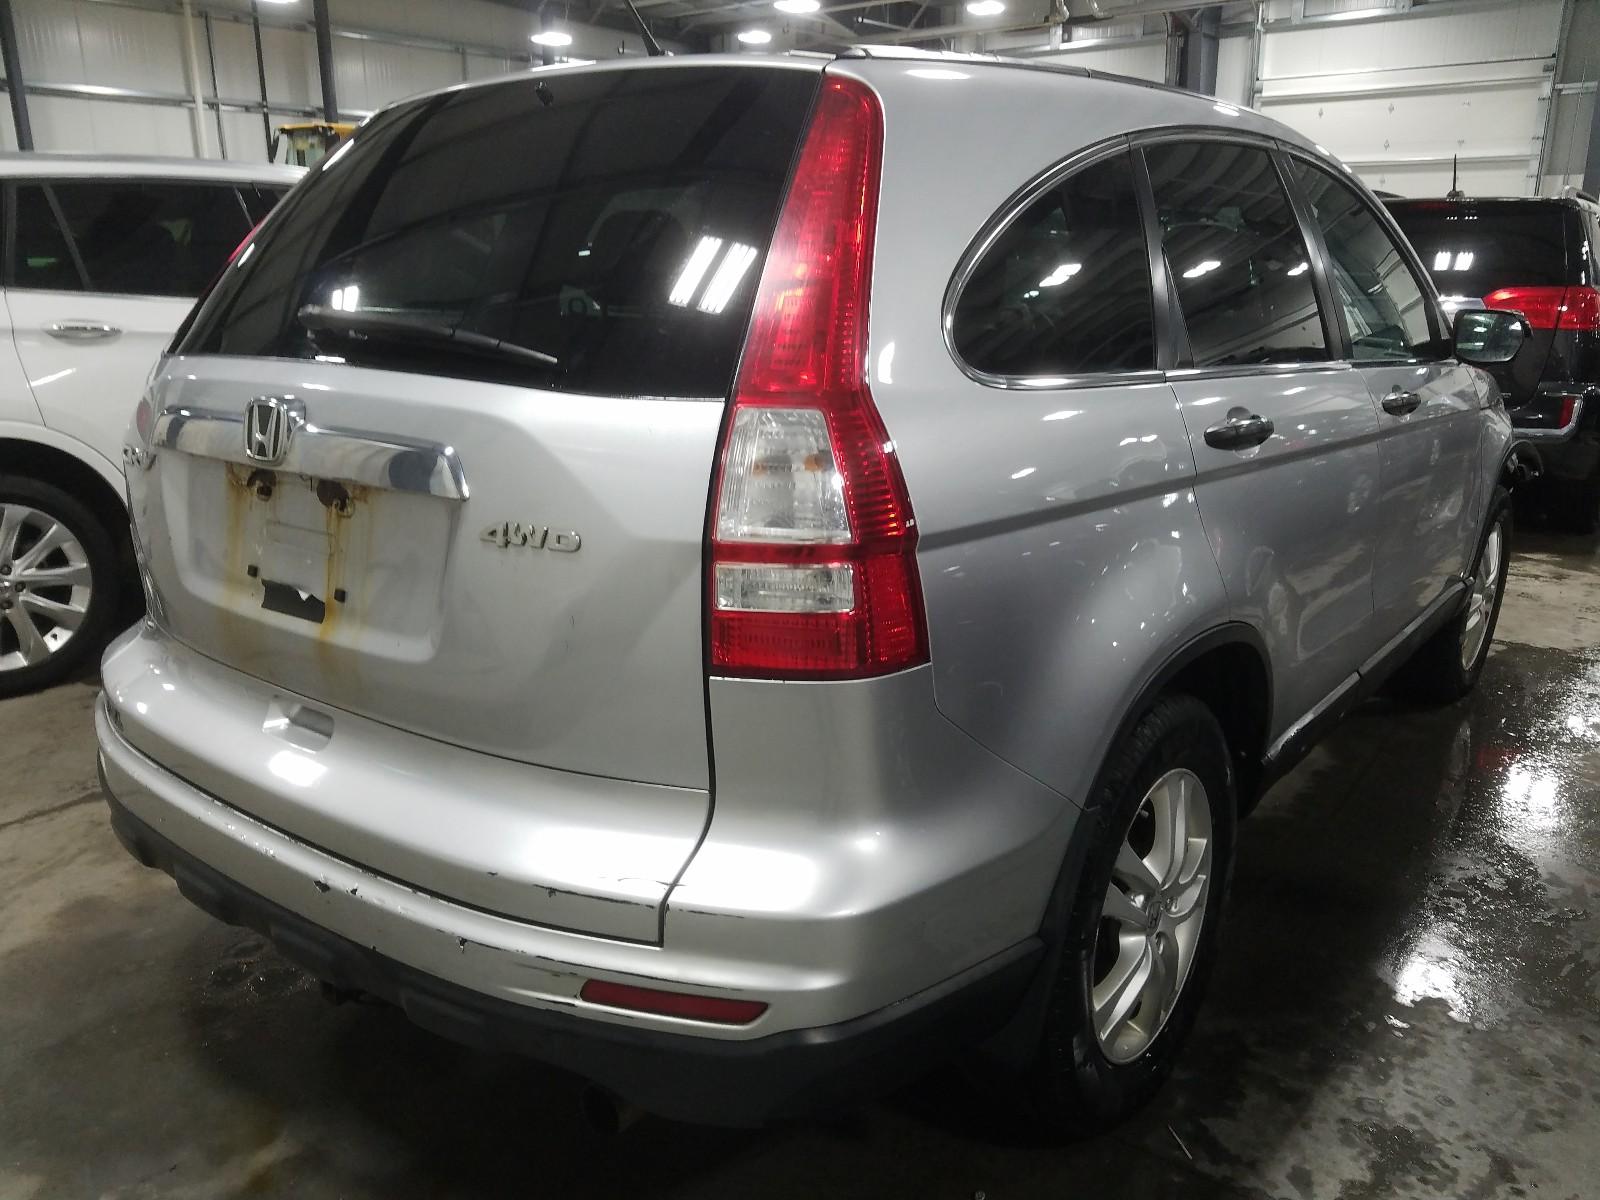 3CZRE4H5XAG700888 - 2010 Honda Cr-V Ex 2.4L rear view